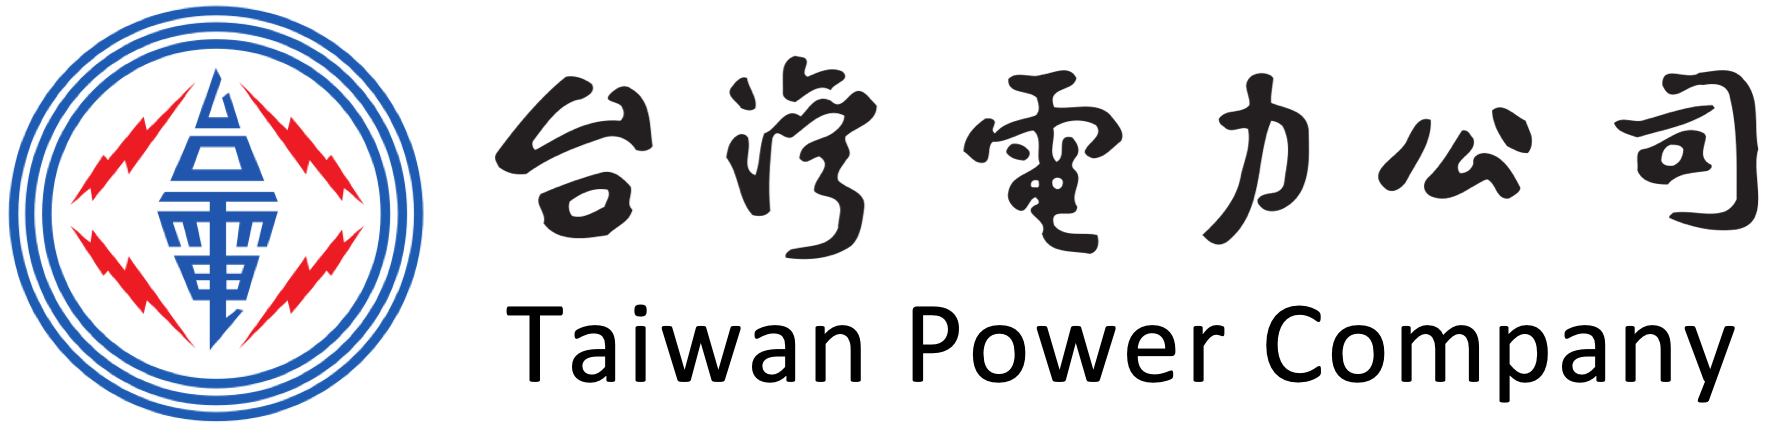 Taiwan Power